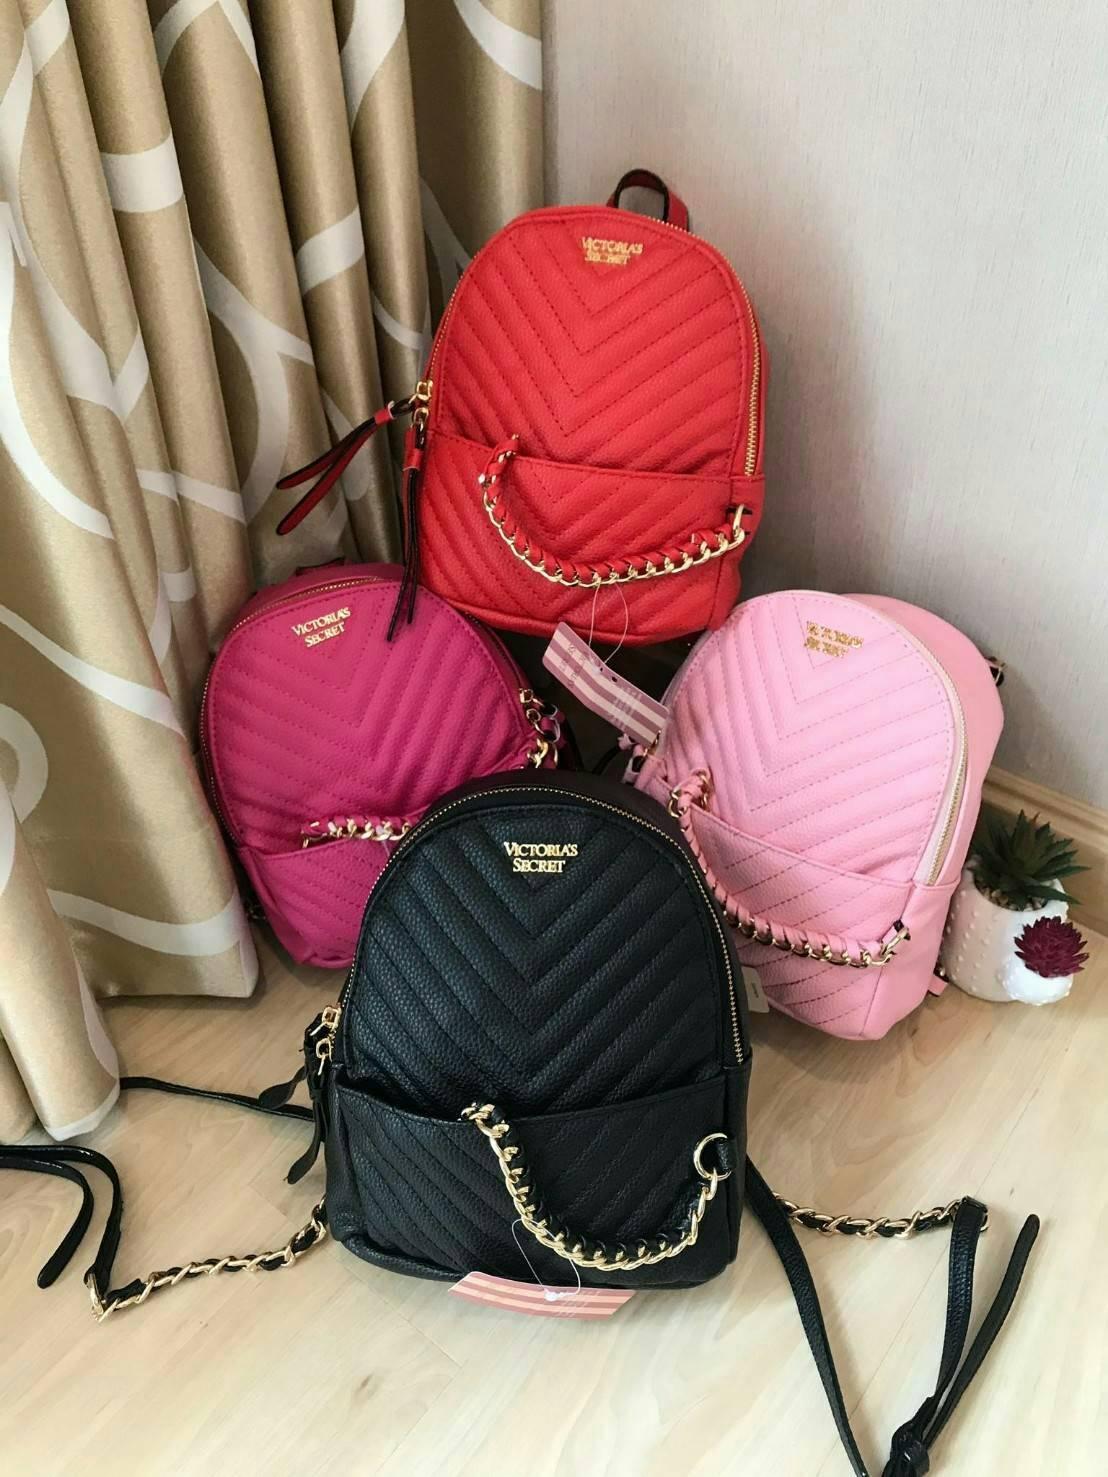 13370c1cc1a44 Victoria's Secret Pebbled V-Quilt Small City Backpack กระเป๋าเป้ ...